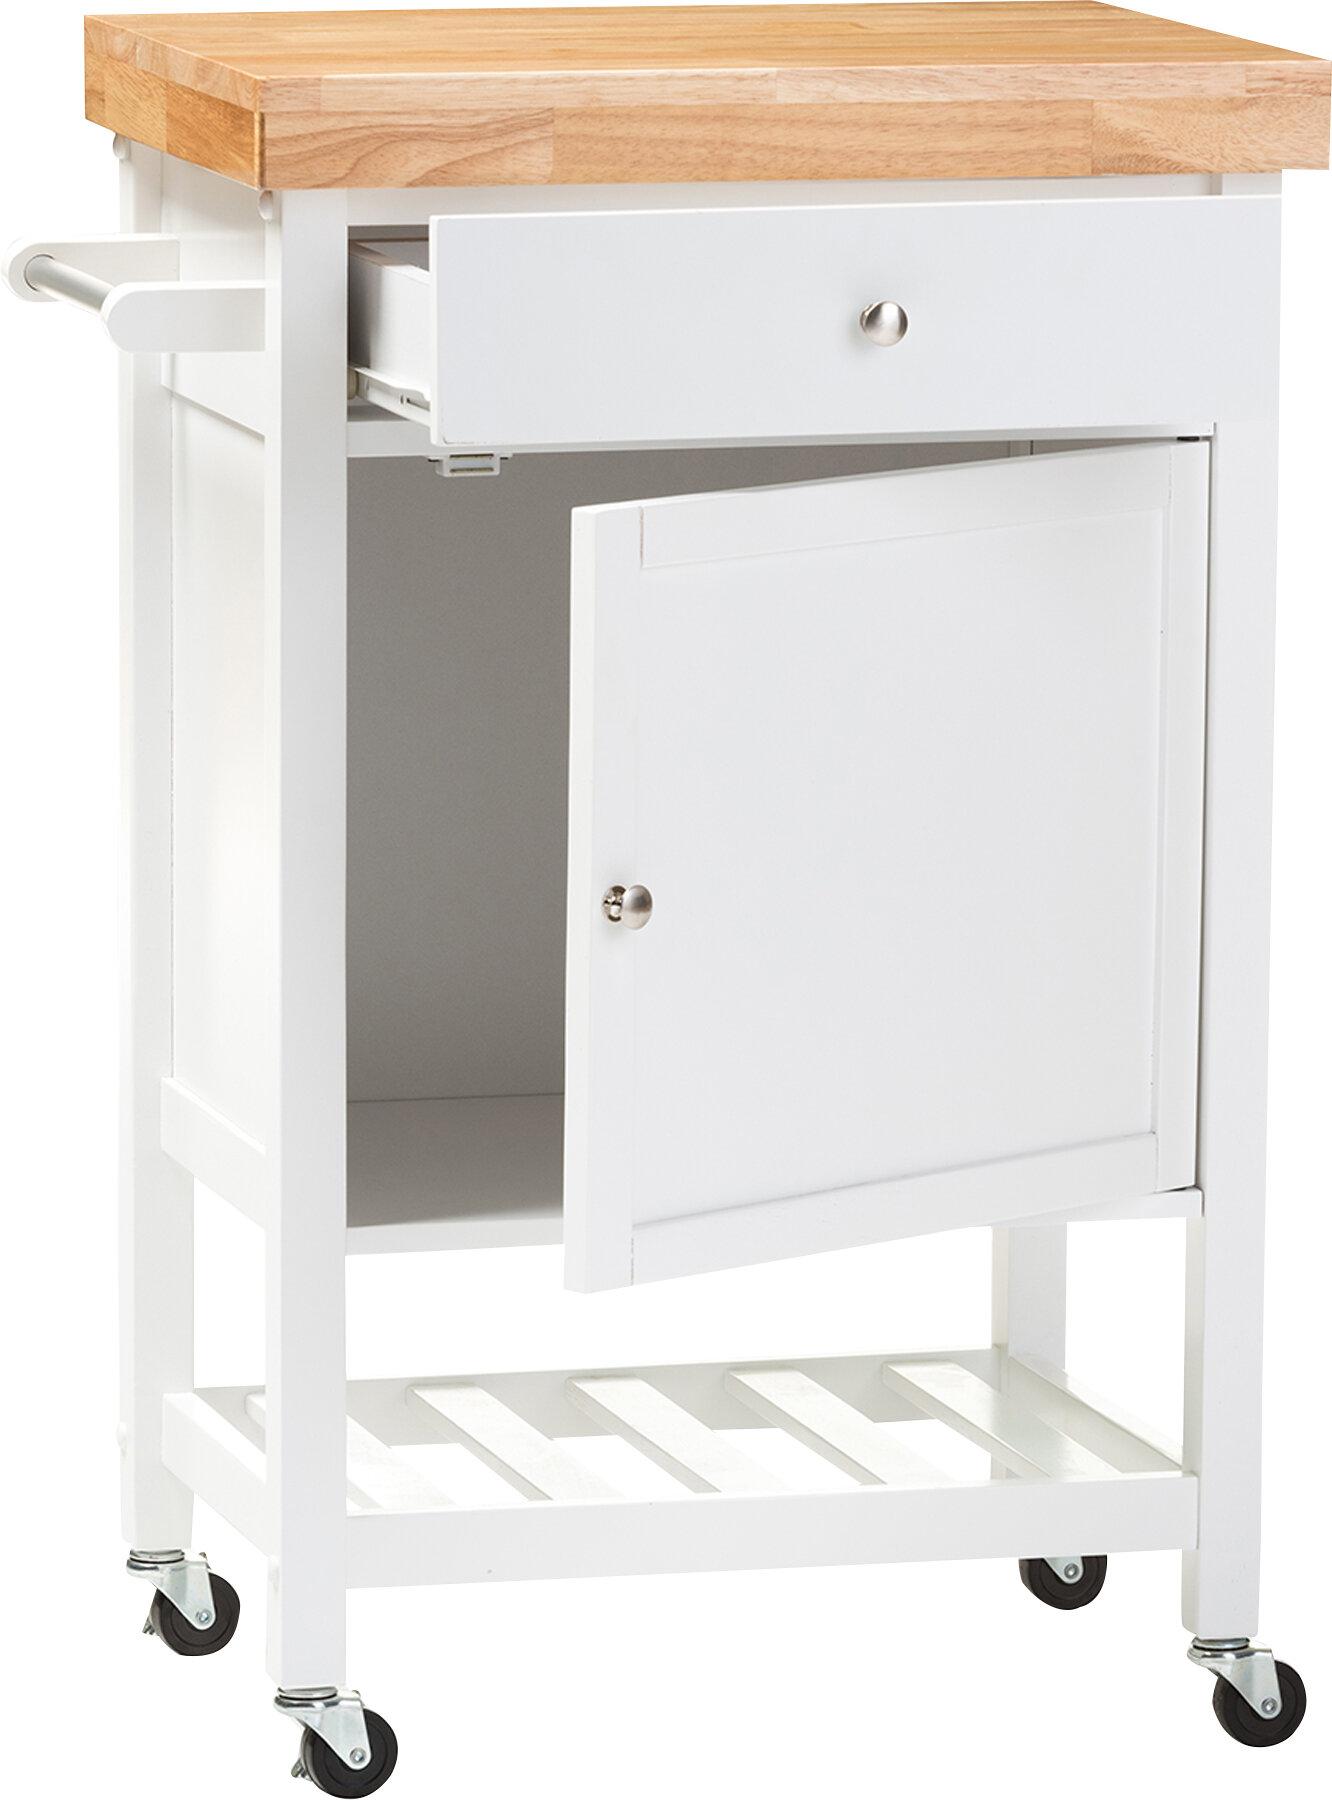 Lucrezia kitchen cart with wood top reviews allmodern